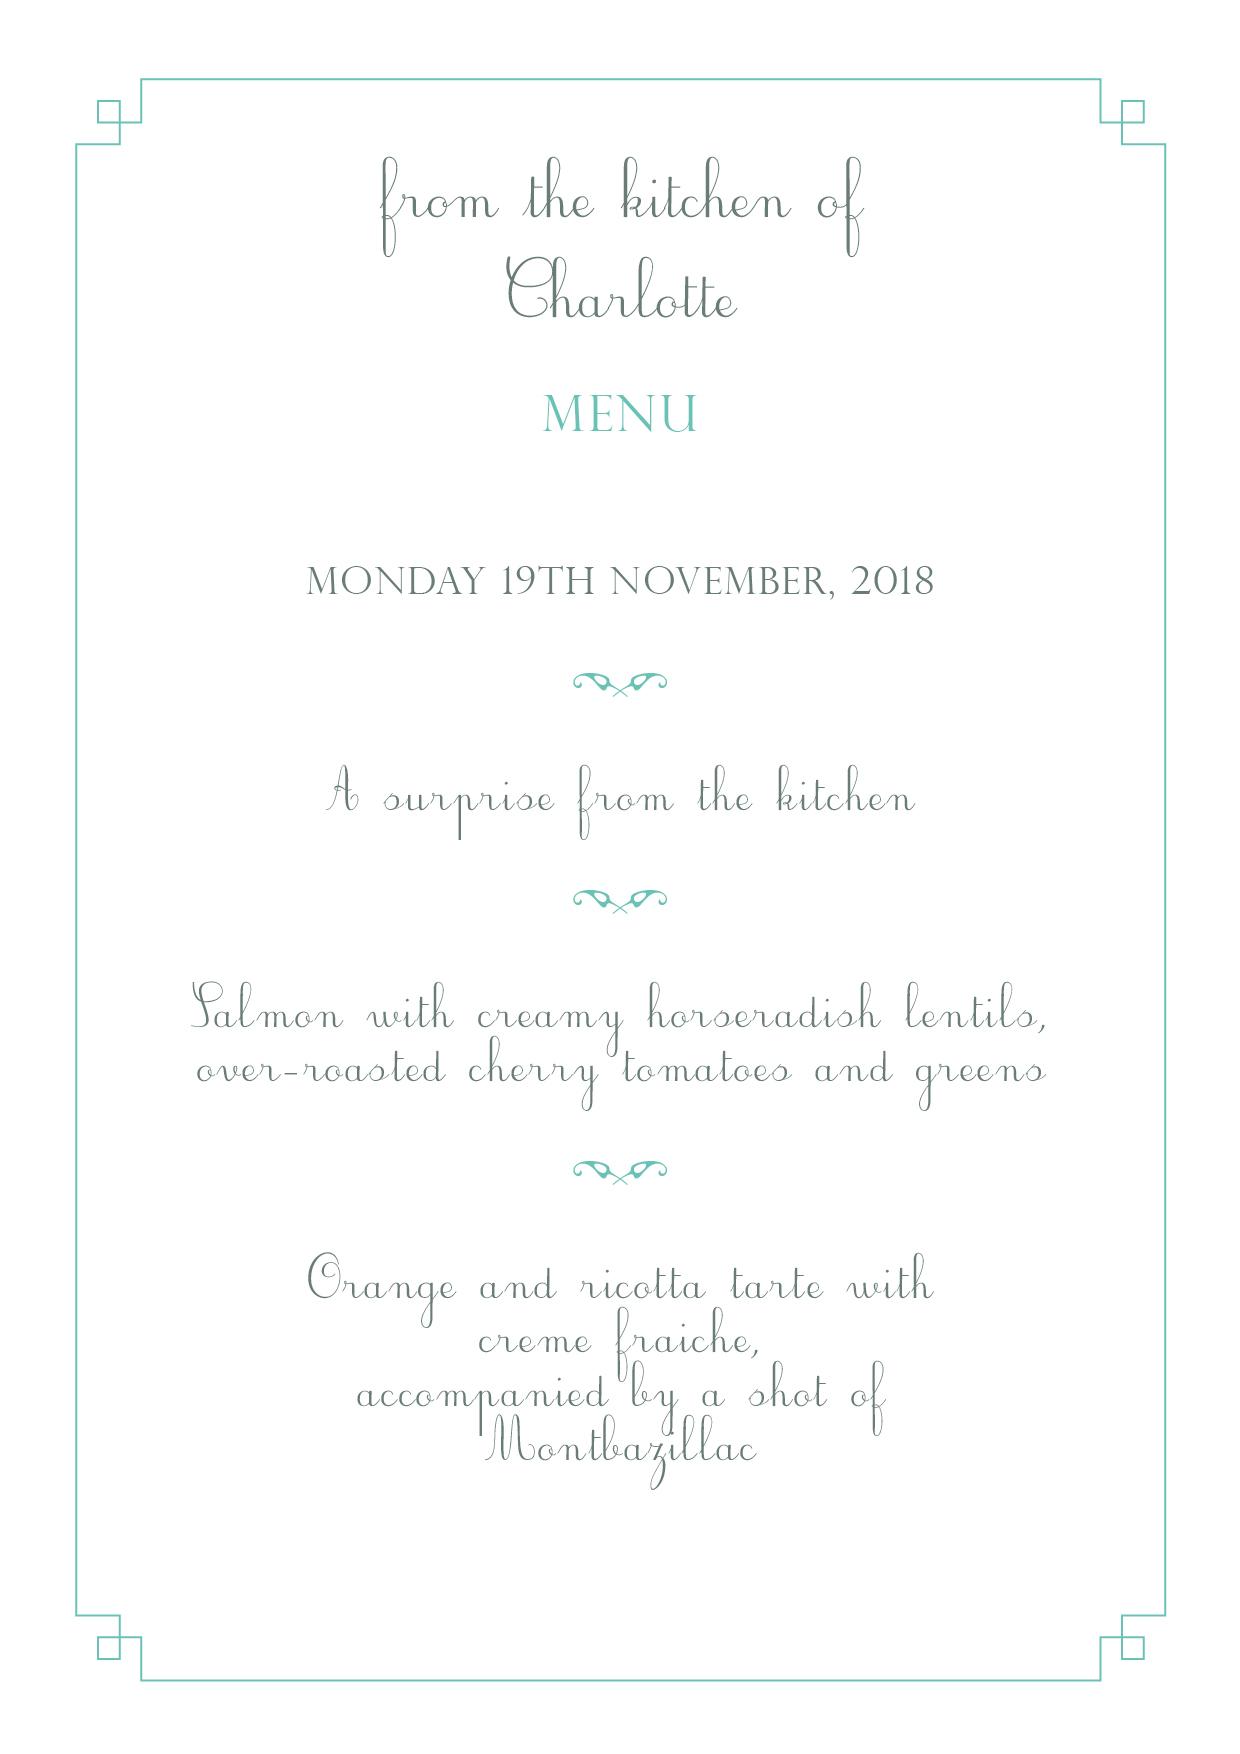 Charlotte's menus 19.11.18.jpg